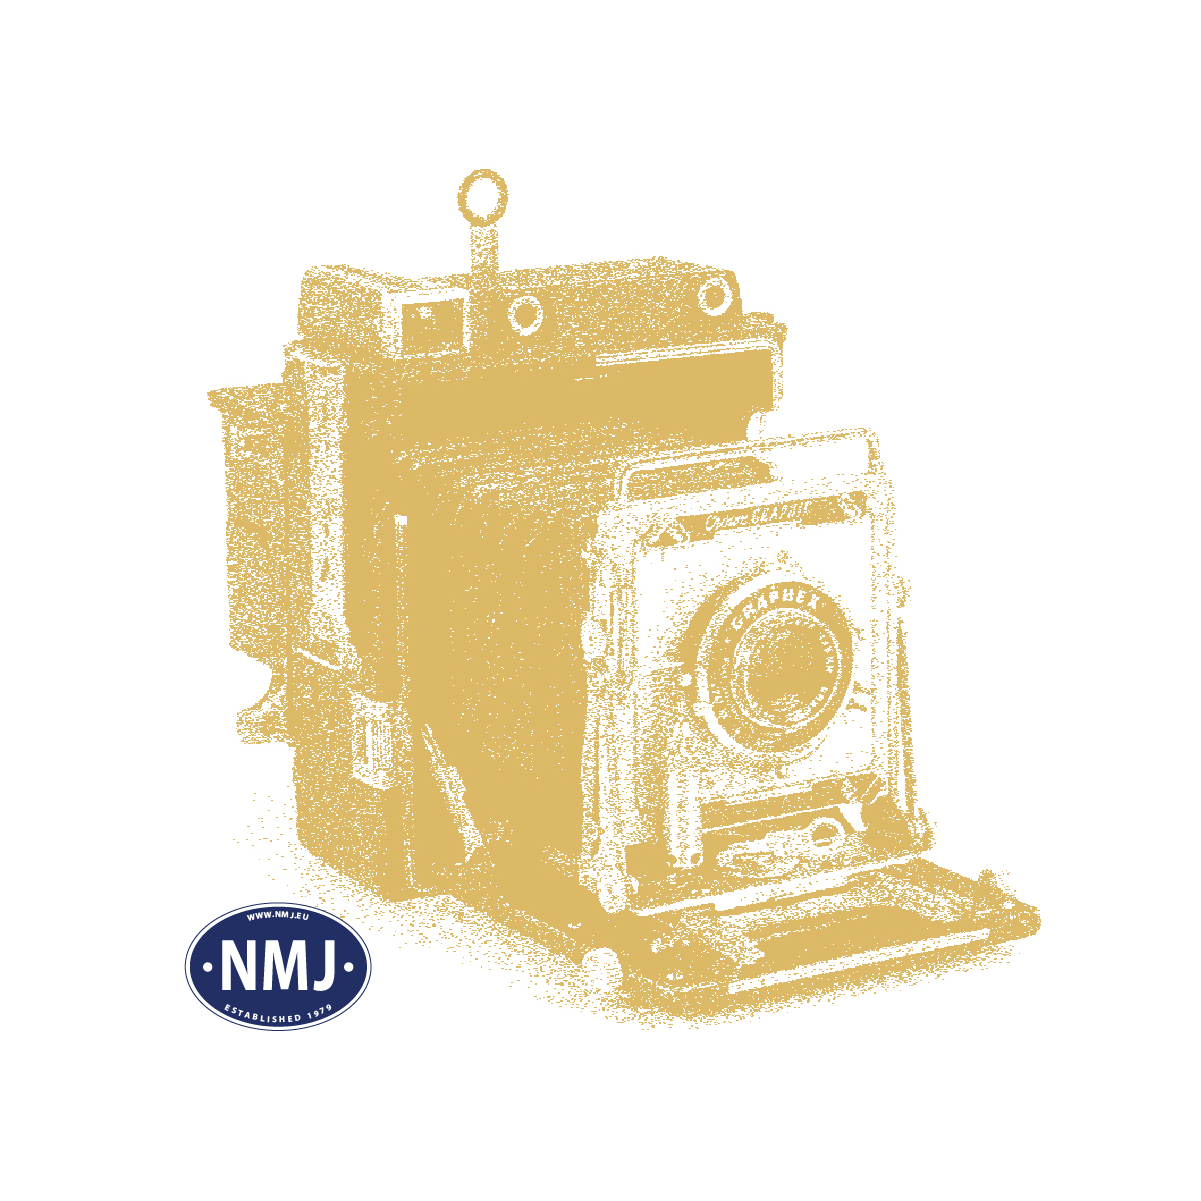 NMJT86.201 - NMJ Topline NSB El11.2107, Gammeldesign, DC